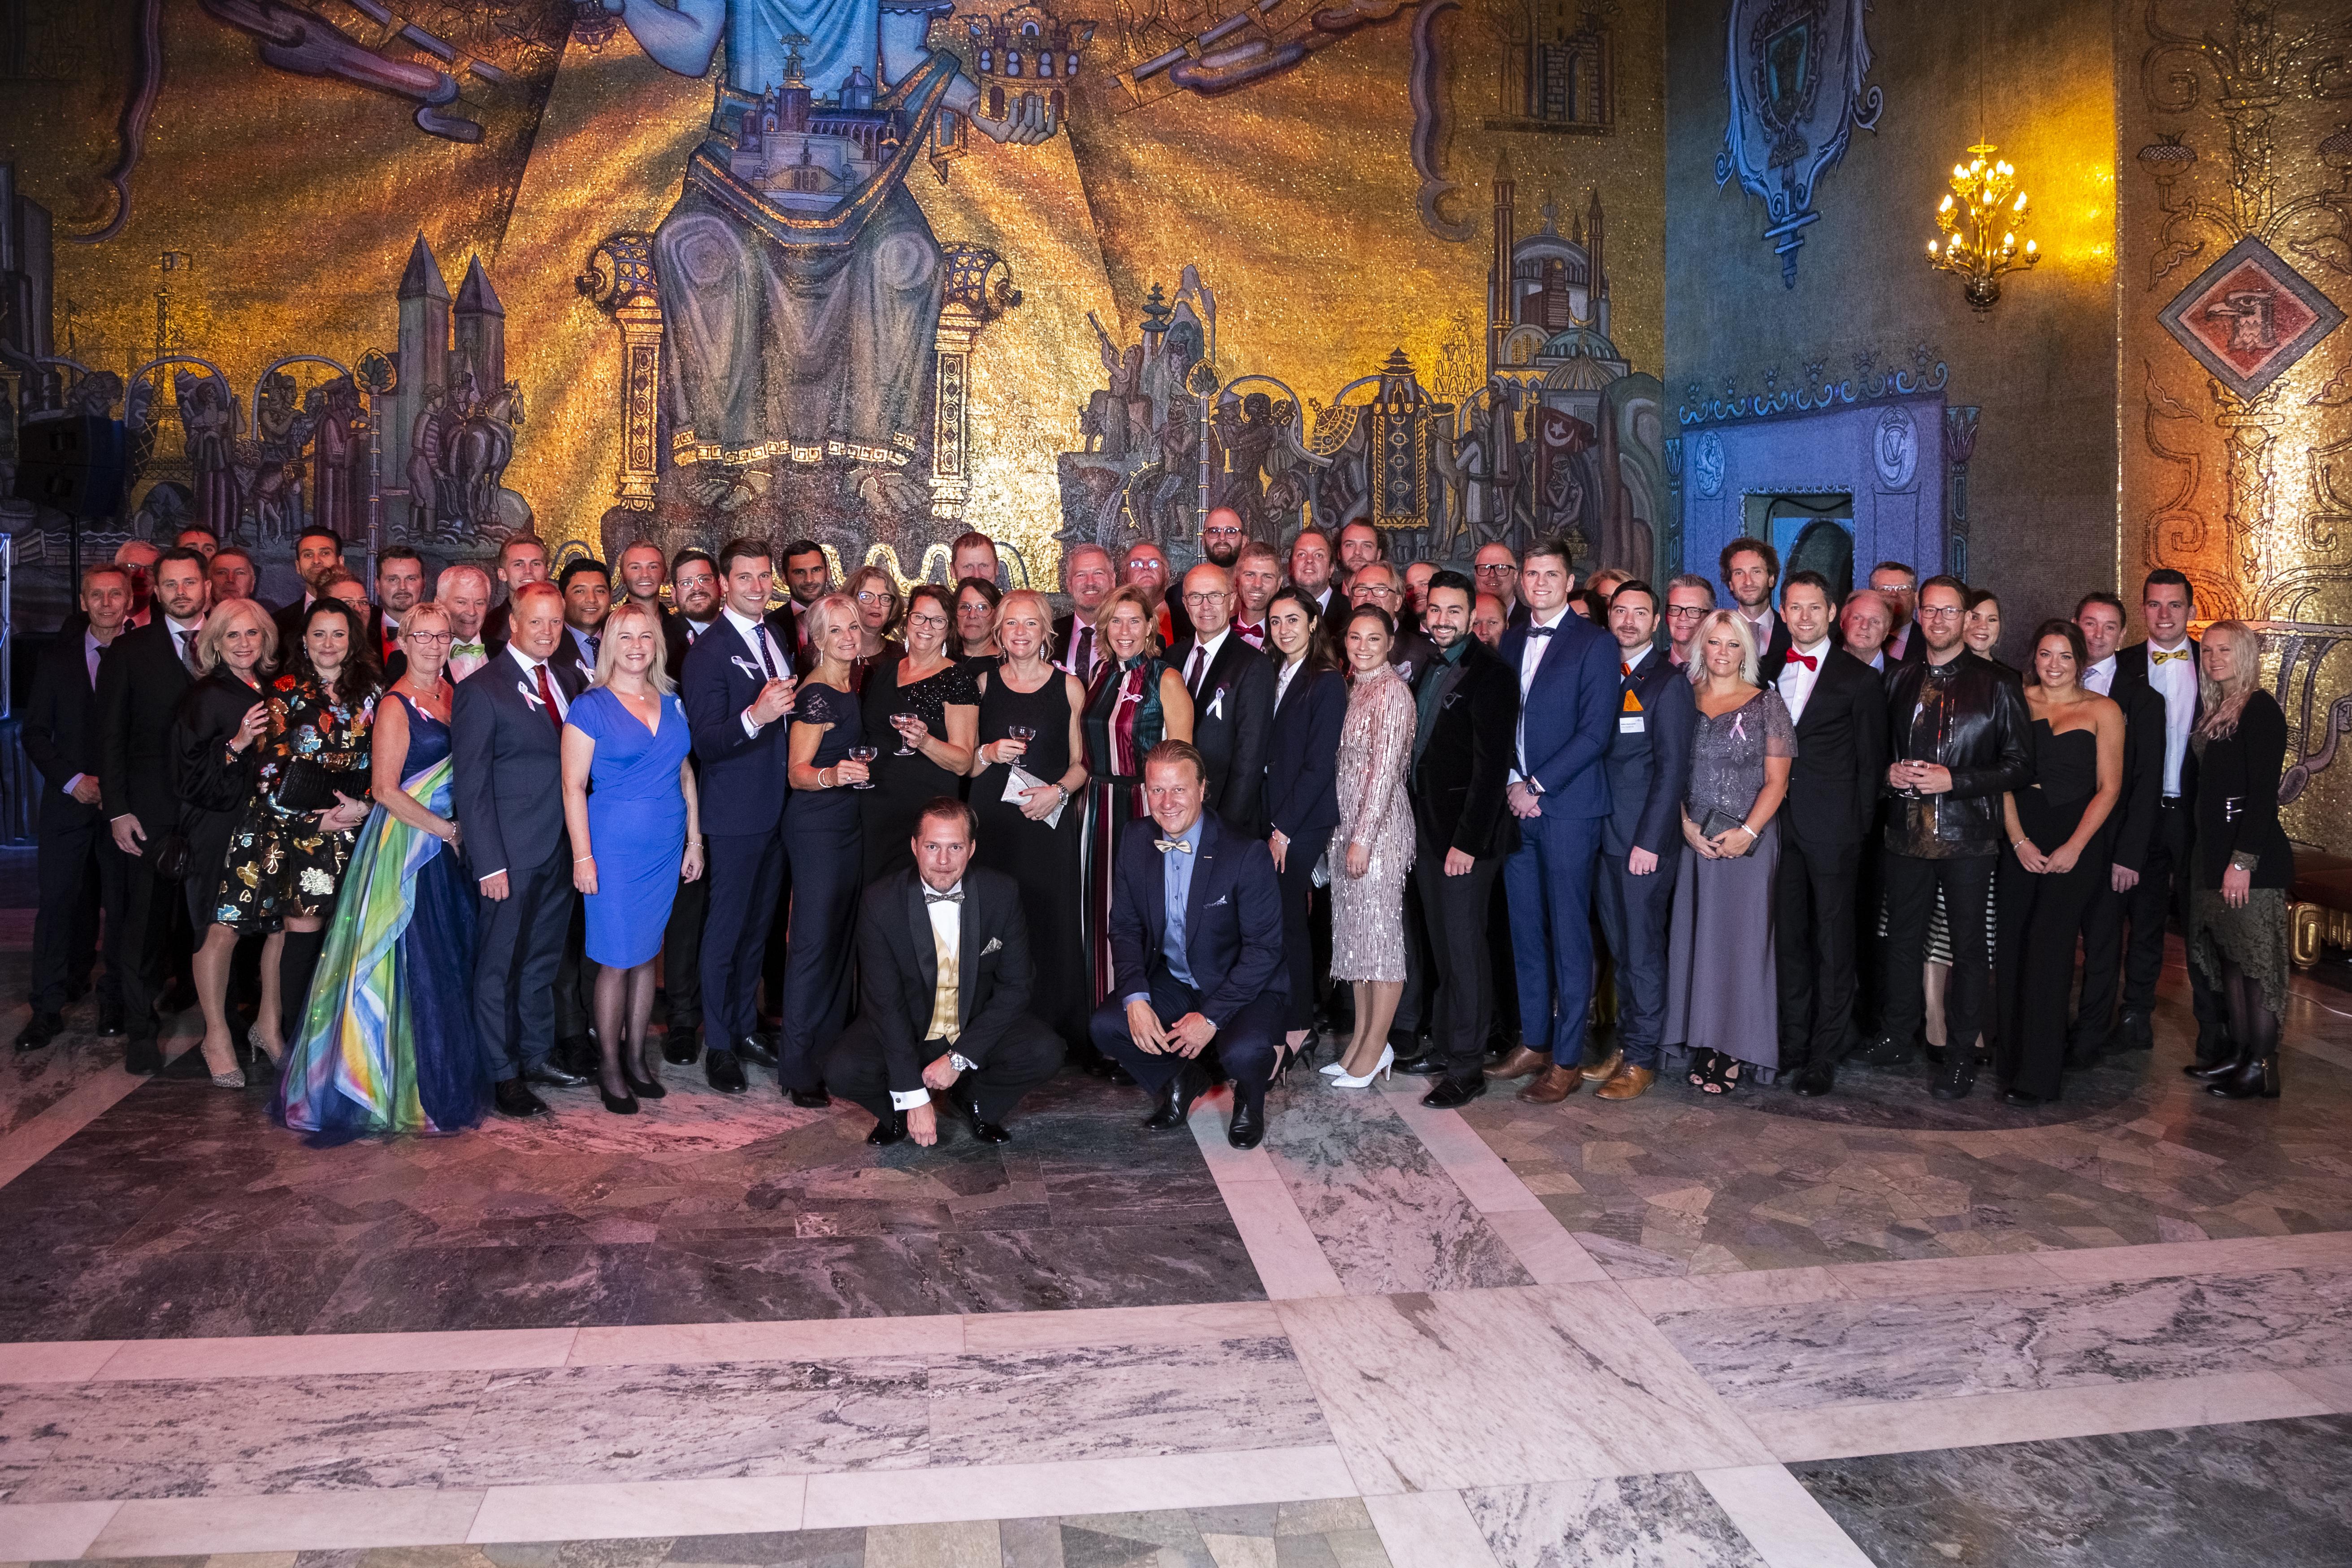 sweden's young entrepreneurs 2019